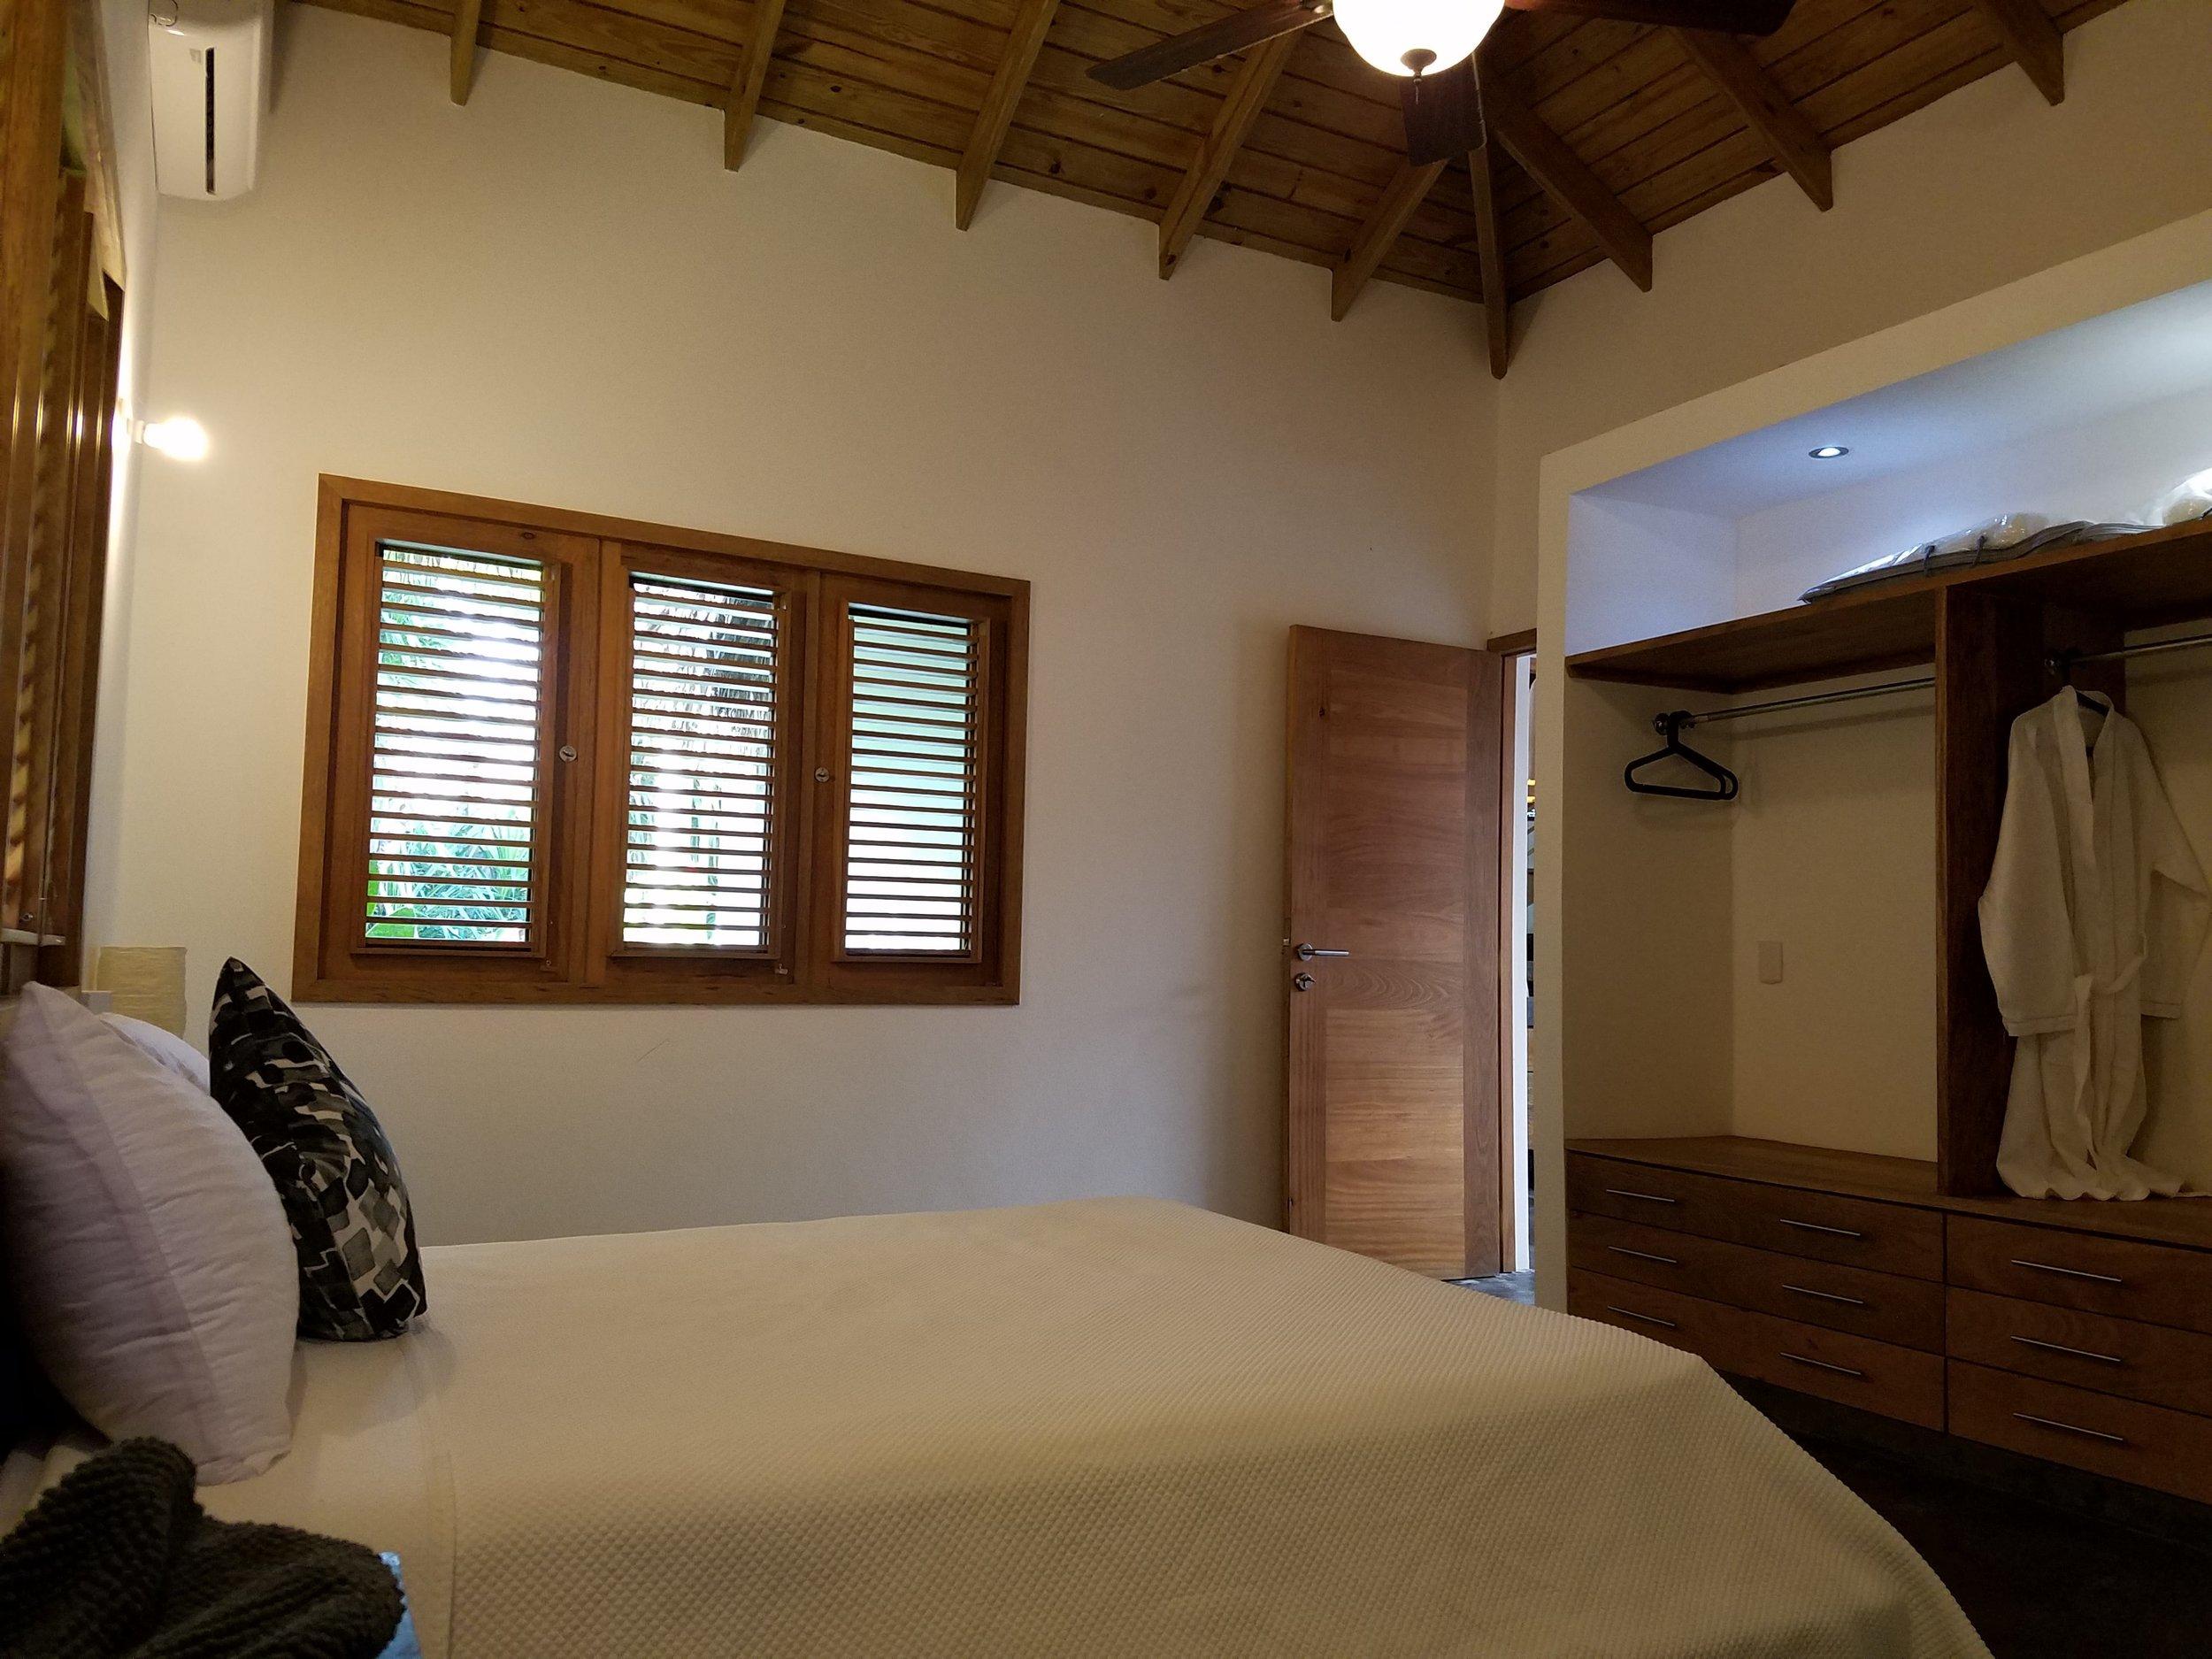 Villa for rent Las Terrenas Cote ci cote la10-min.jpg